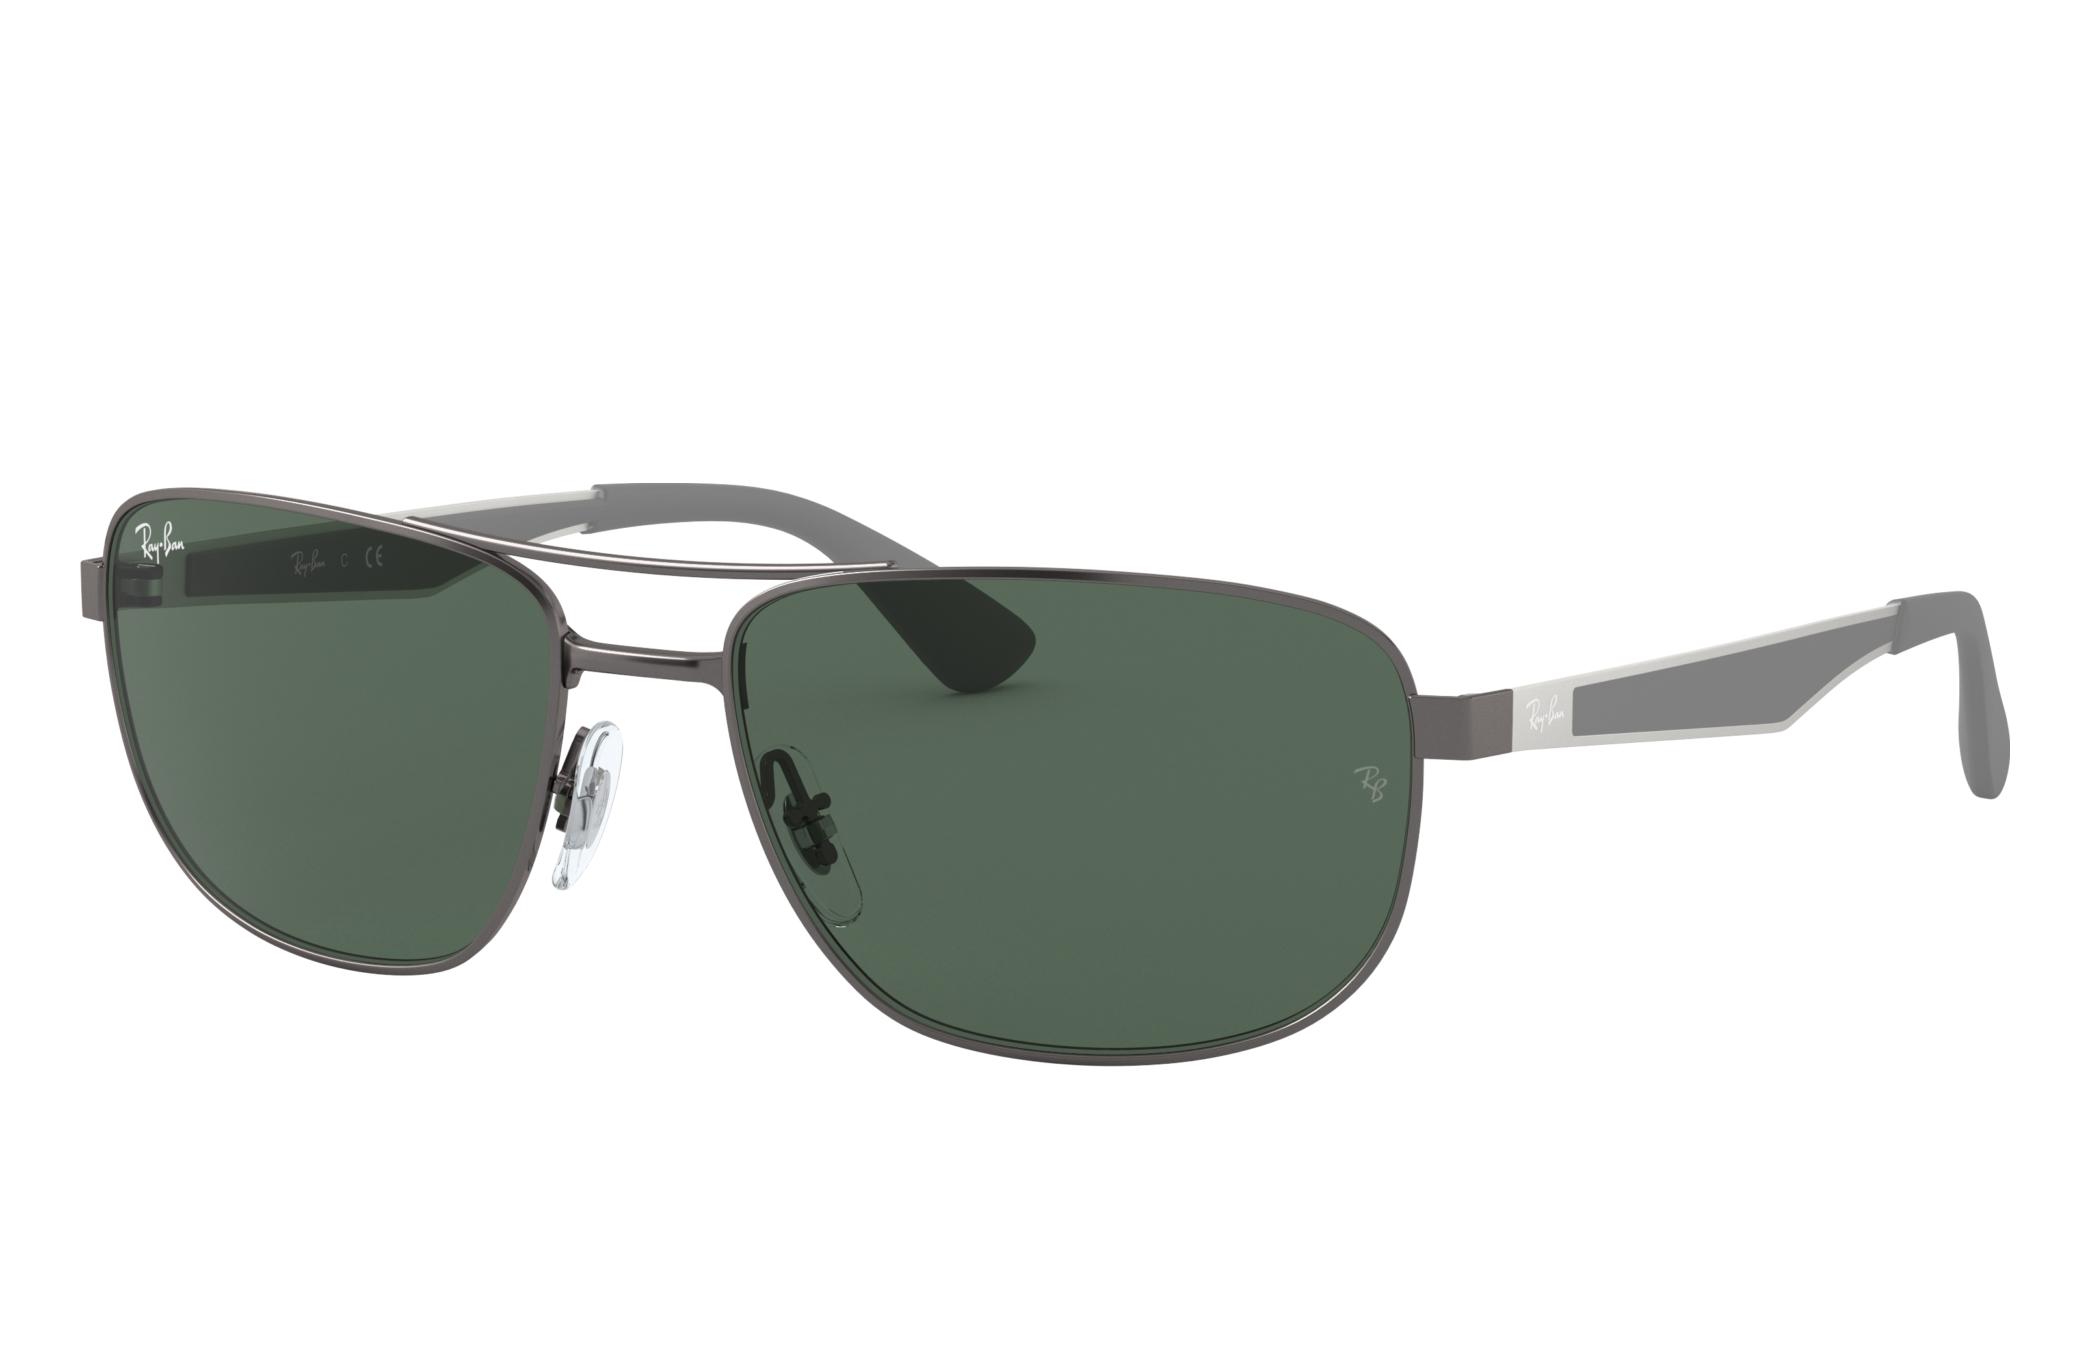 Ray-Ban Rb3528 Gunmetal, Green Lenses - RB3528